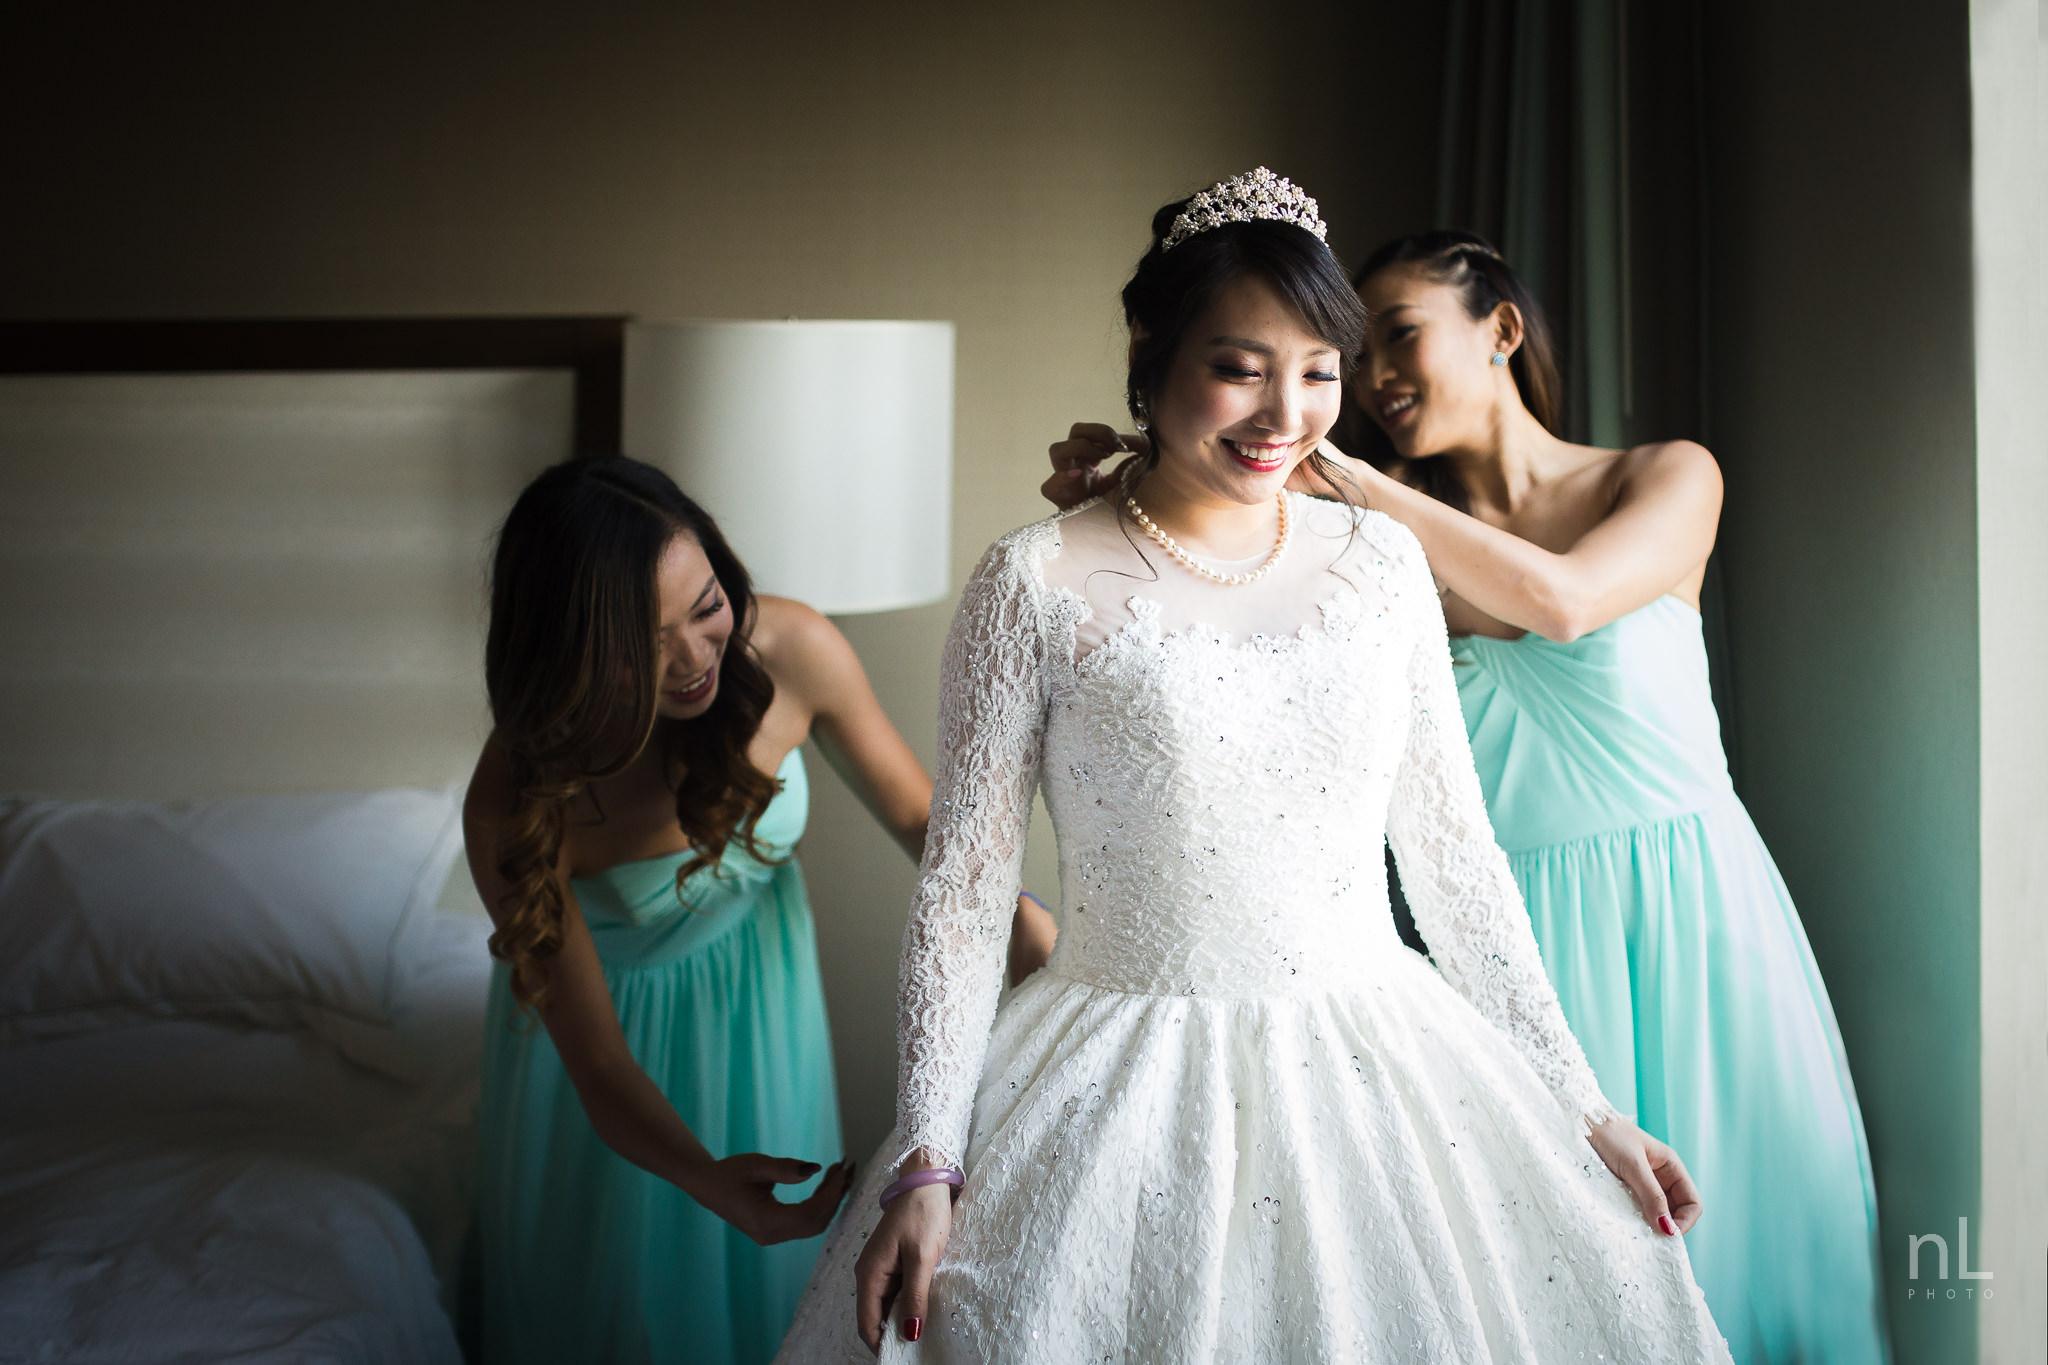 nick-lie-photography-los-angeles-wedding-photographer-7.jpg